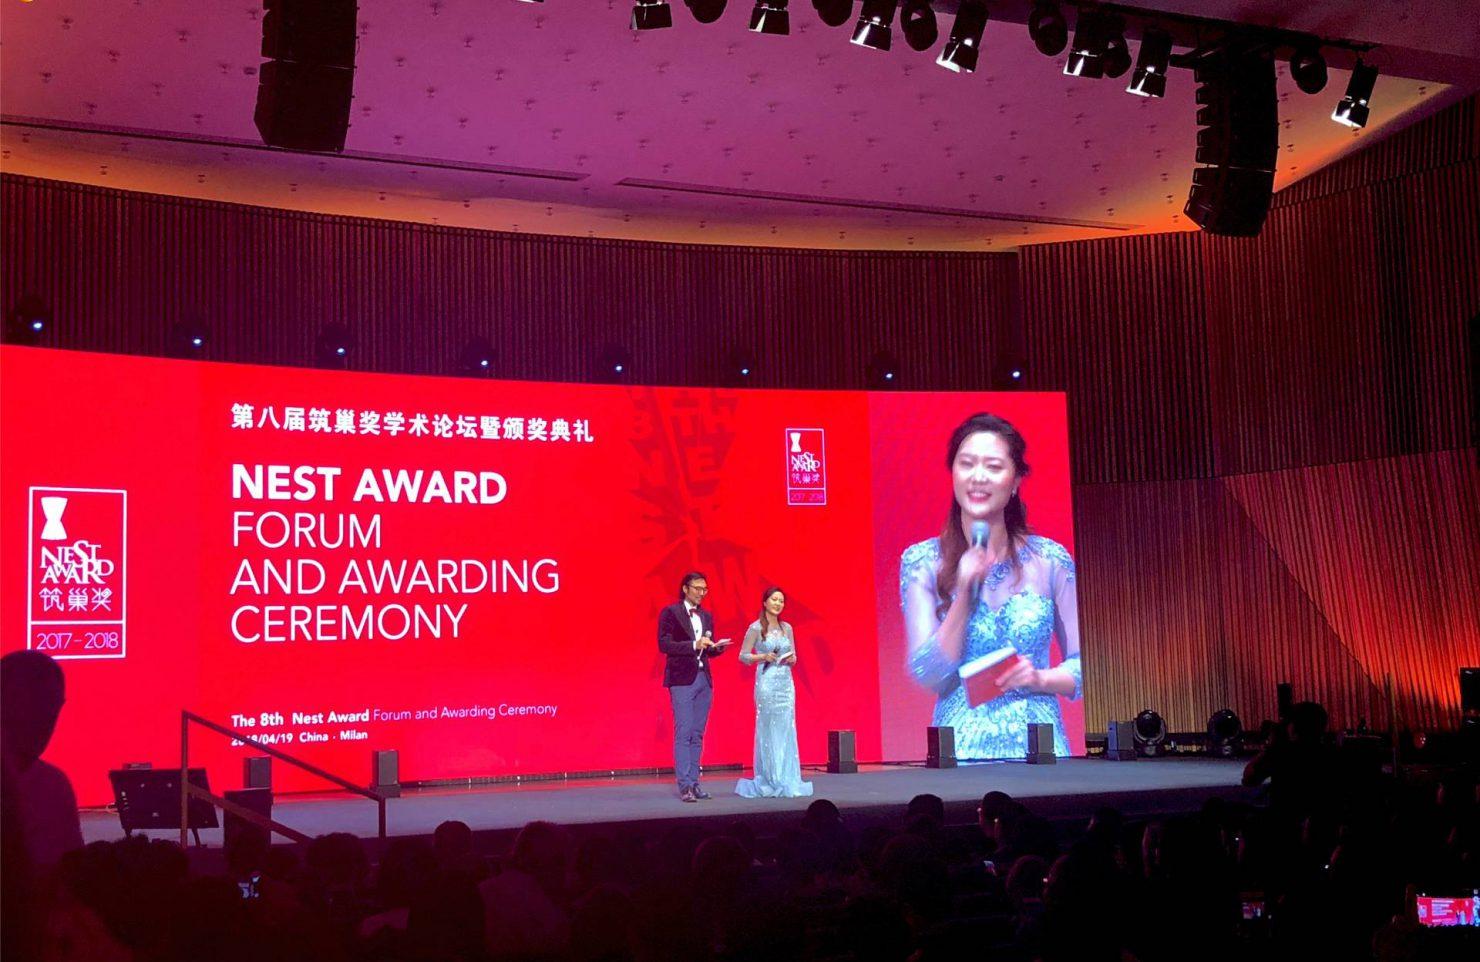 Palco NEST Award